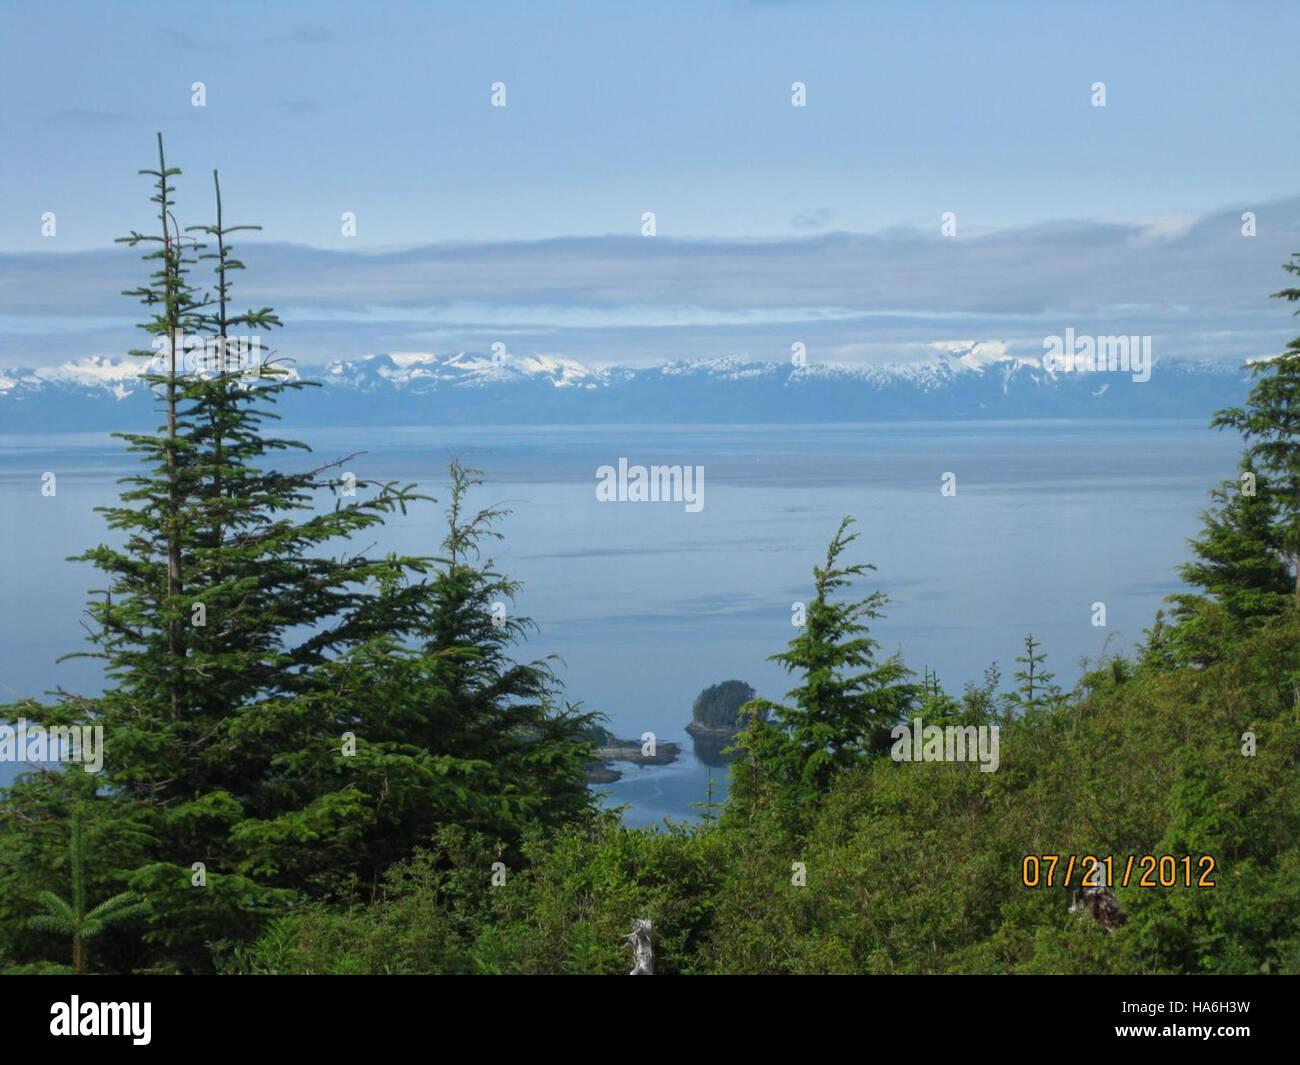 departmentofenergy 9076328317 Kake, Alaska landscape - Stock Image